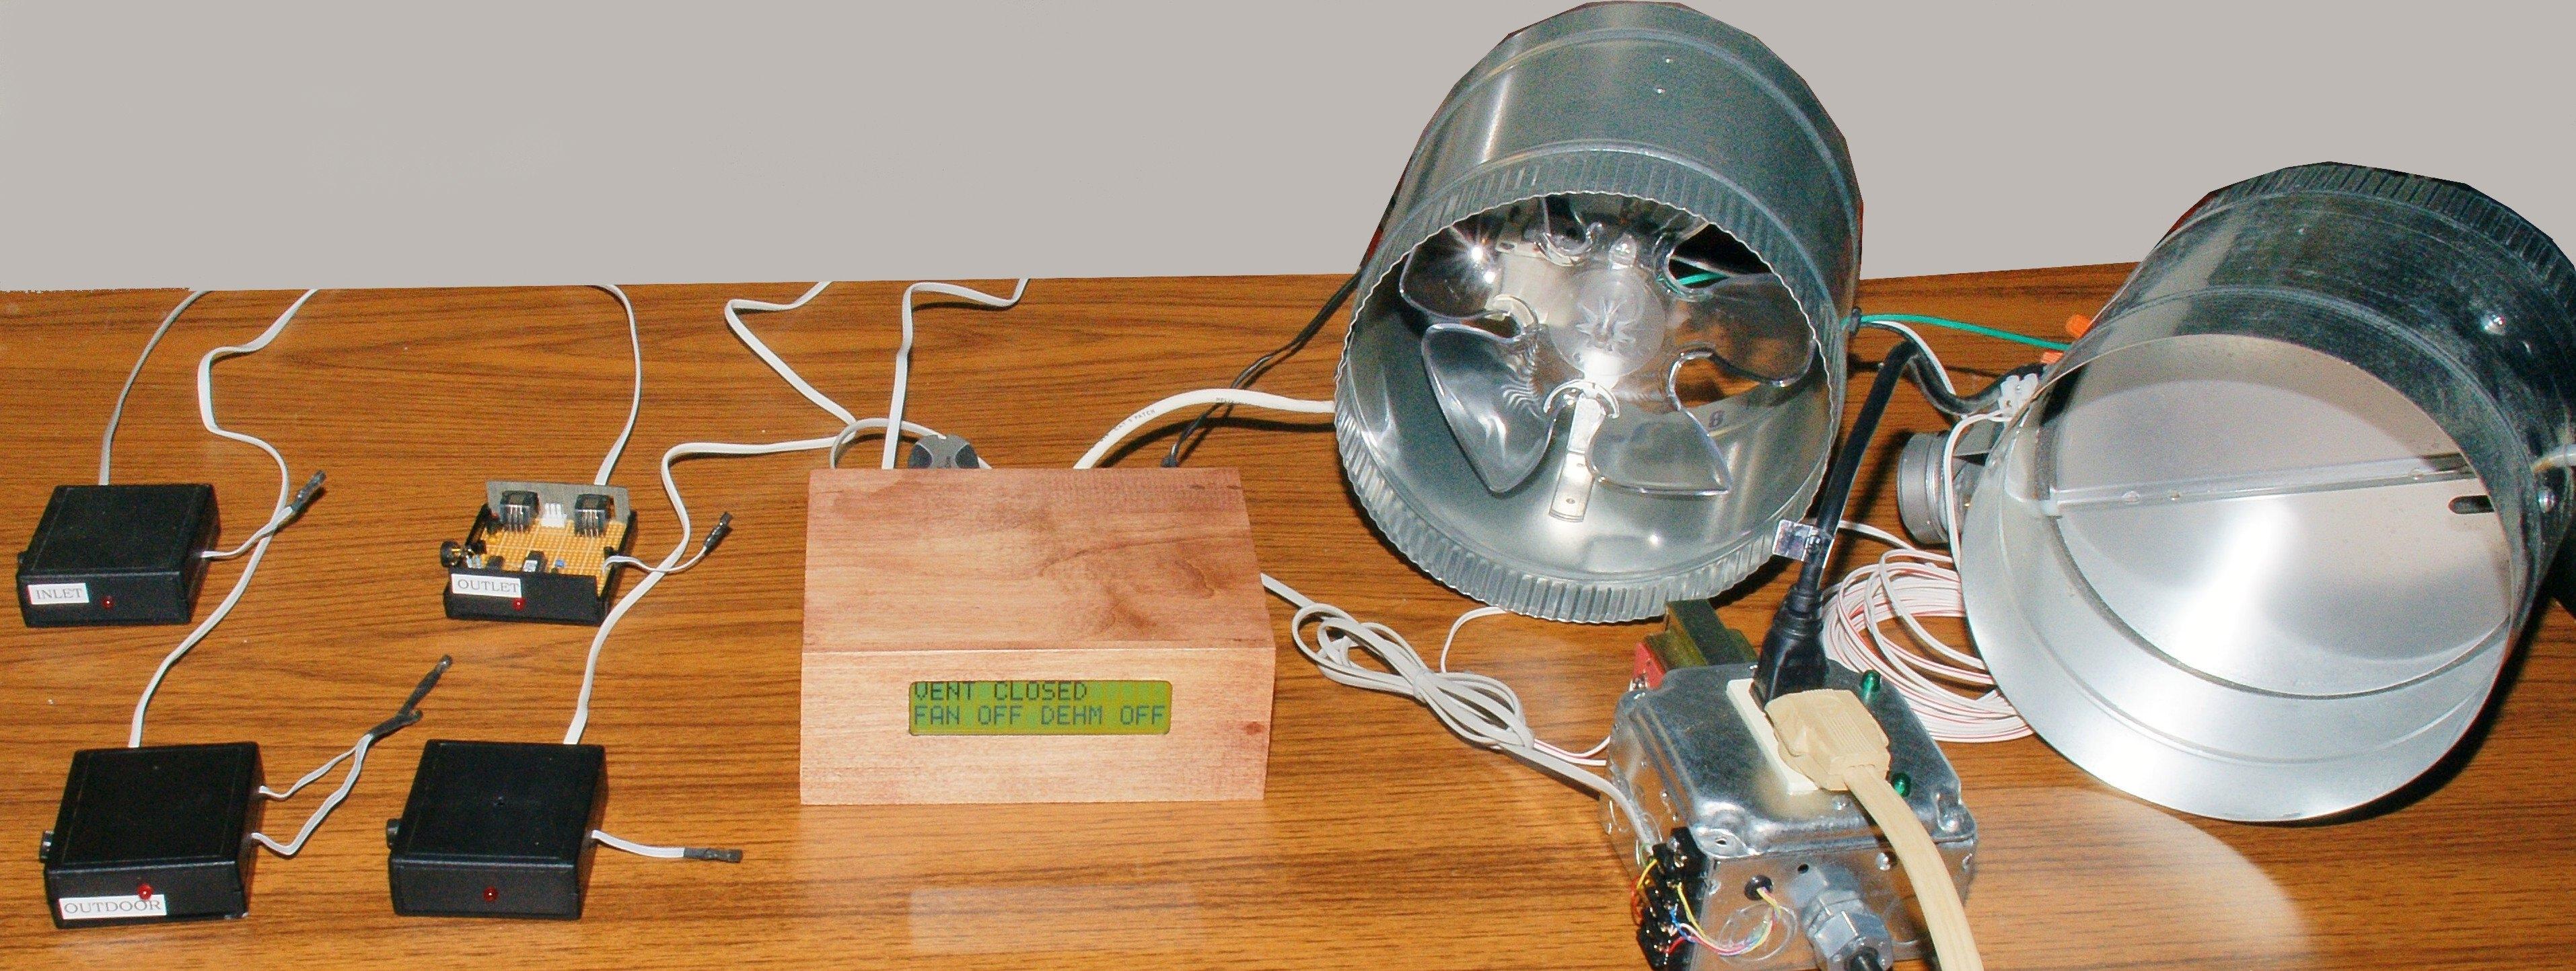 Basement Humidity Controlled Fan